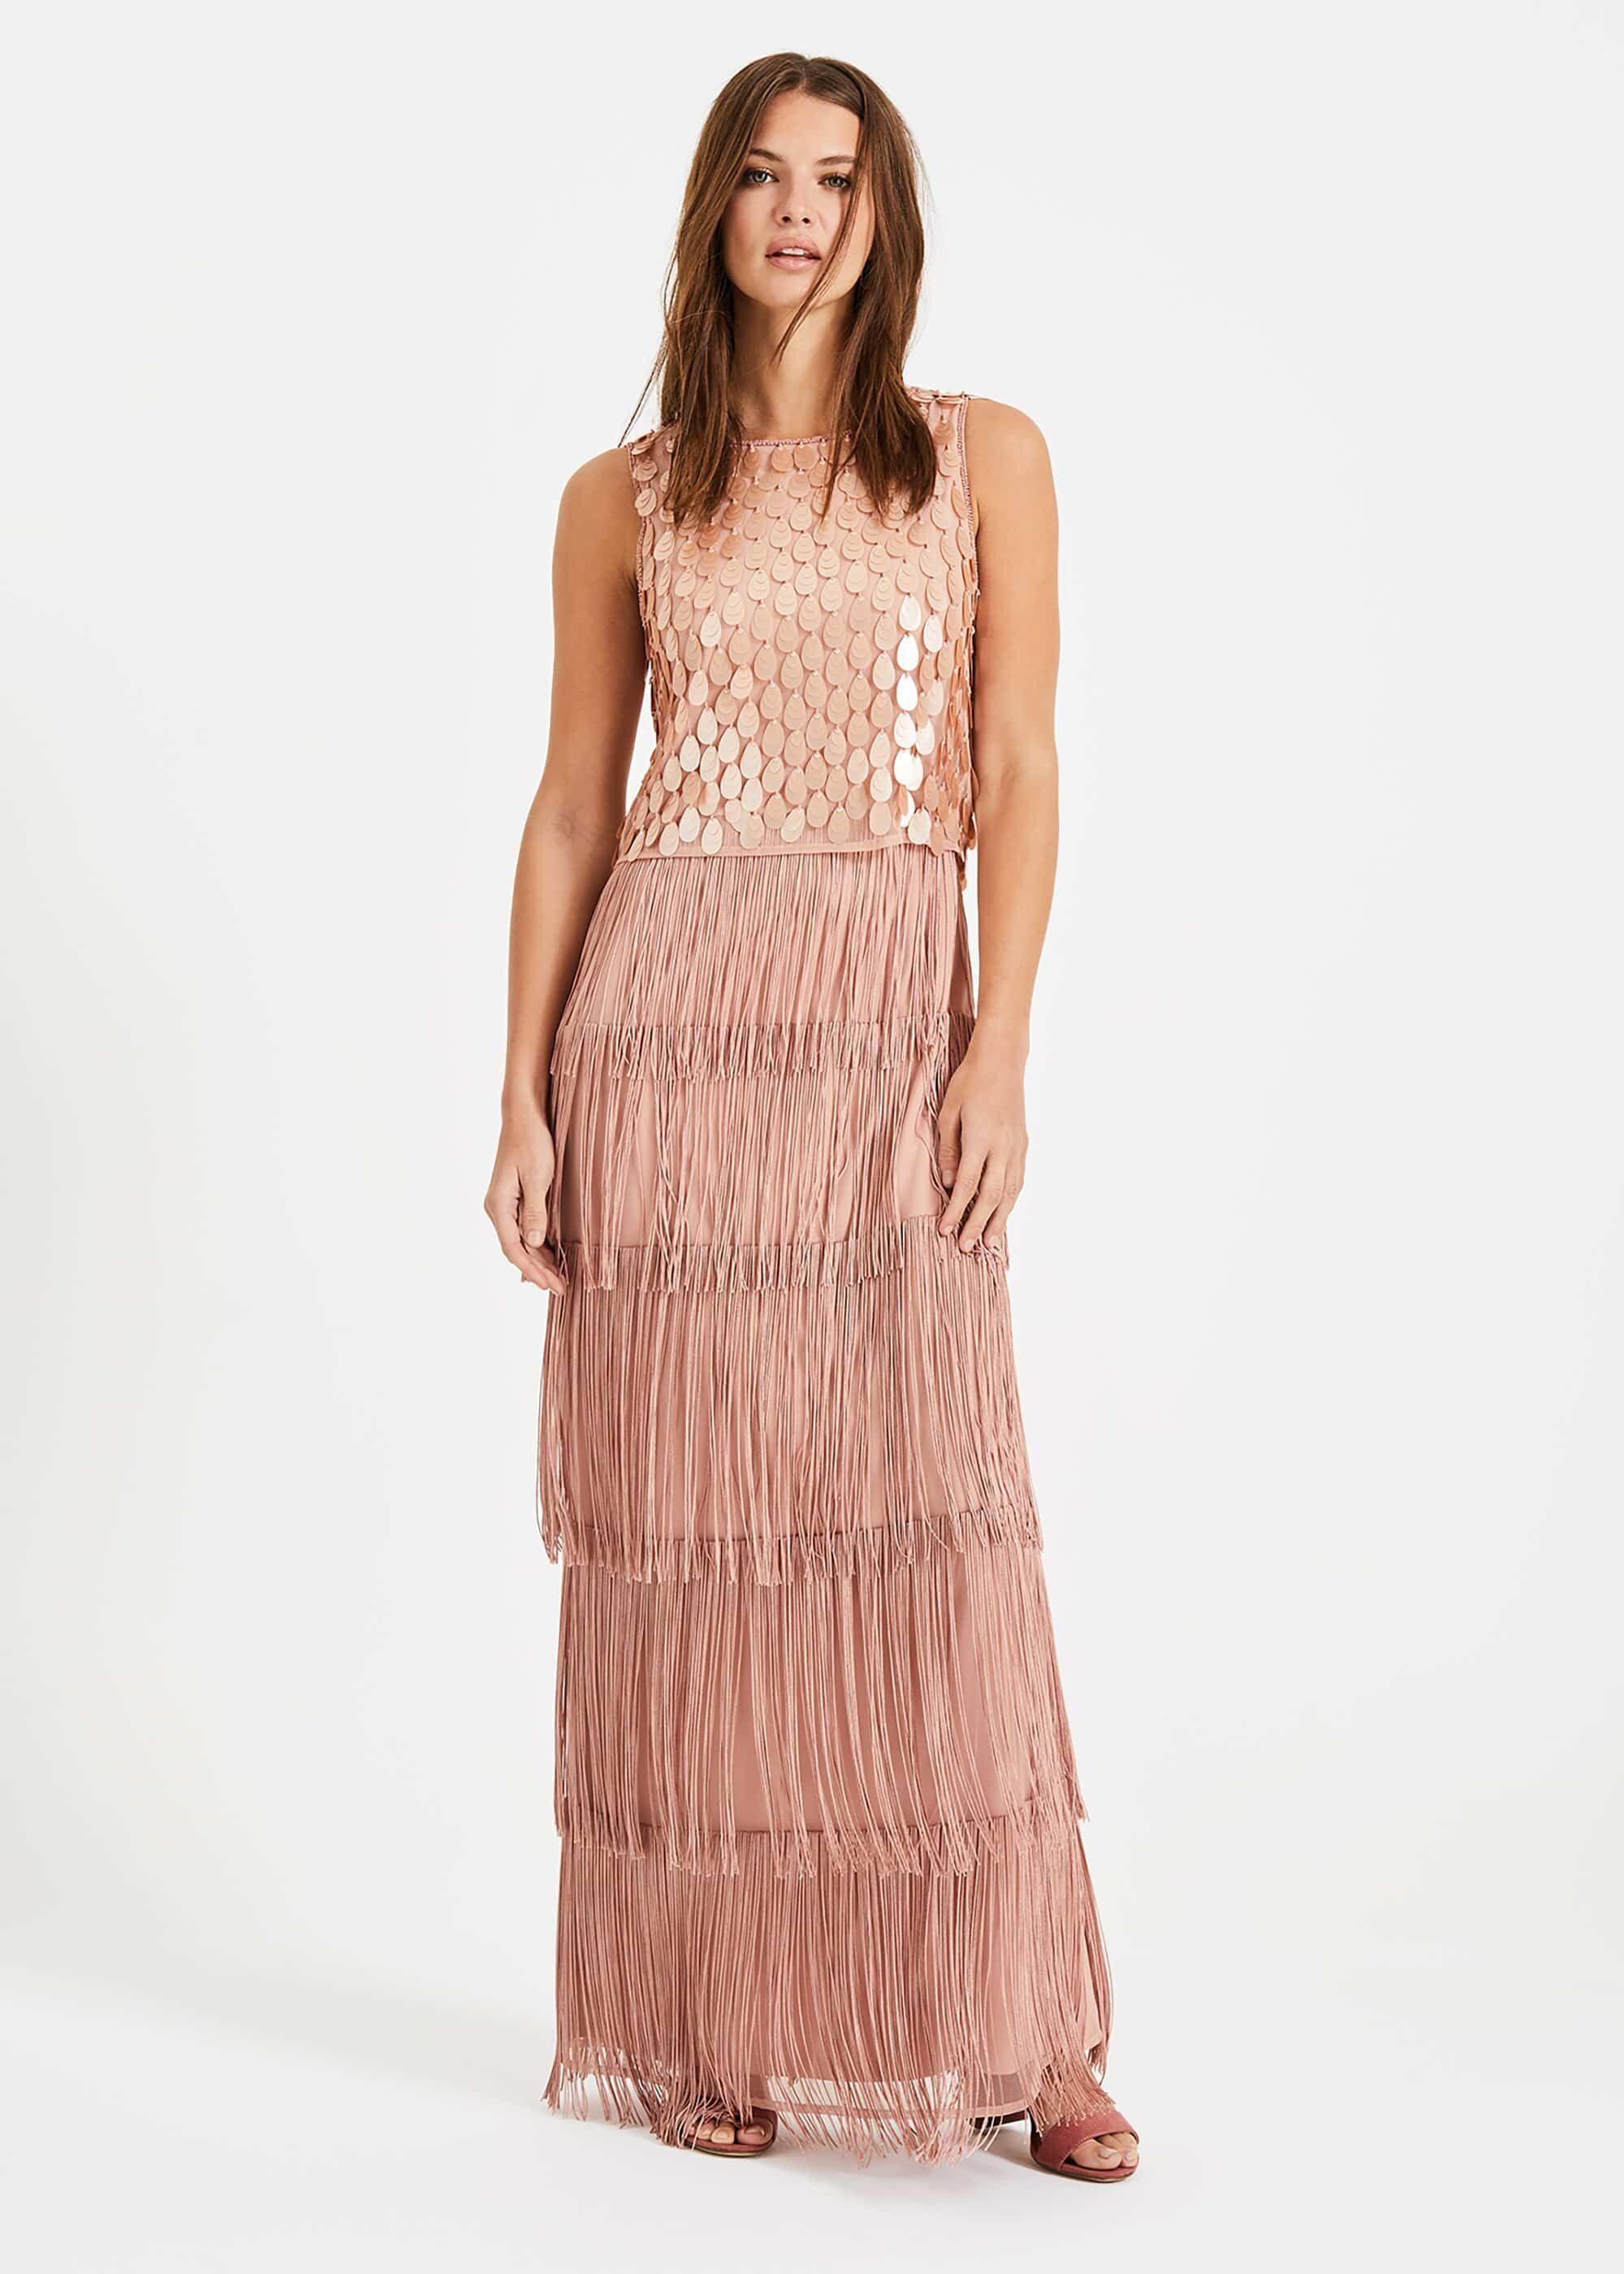 49483fd5c2 Phase Eight - Pink Amandine Fringe Maxi Dress - Lyst. View fullscreen